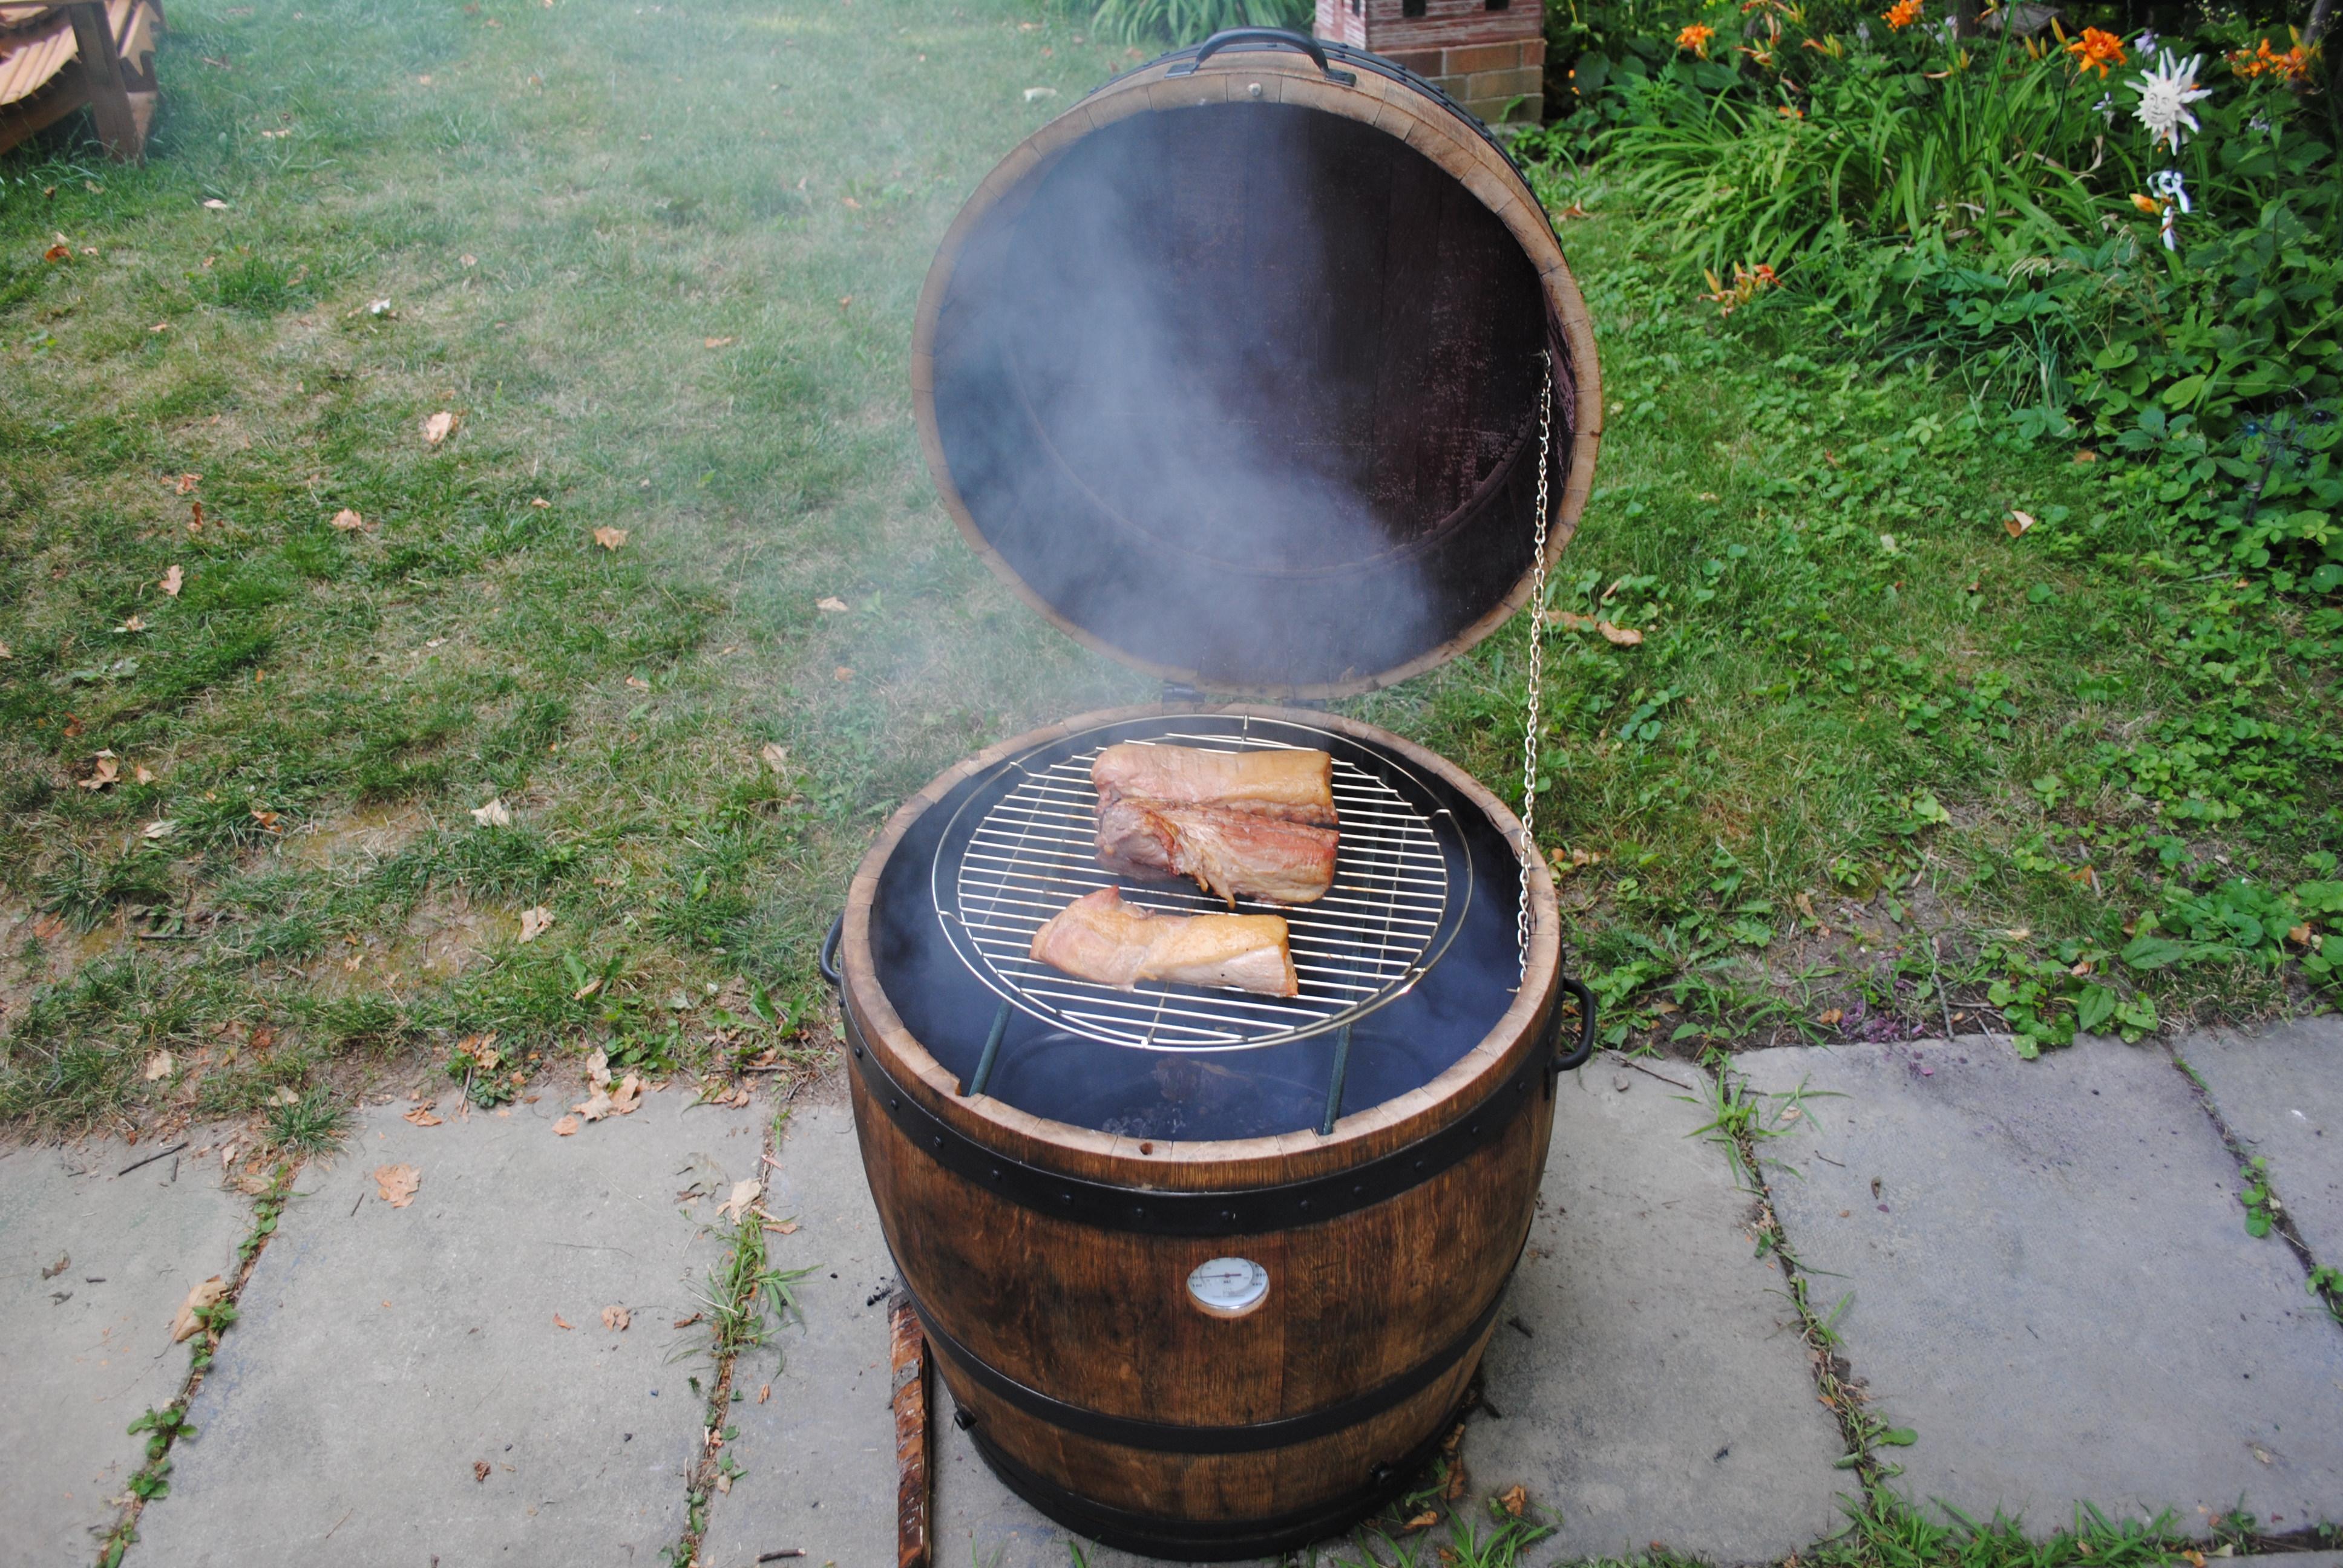 Tsd Custom Woodworking Wine Barrel Smoker And Coolers